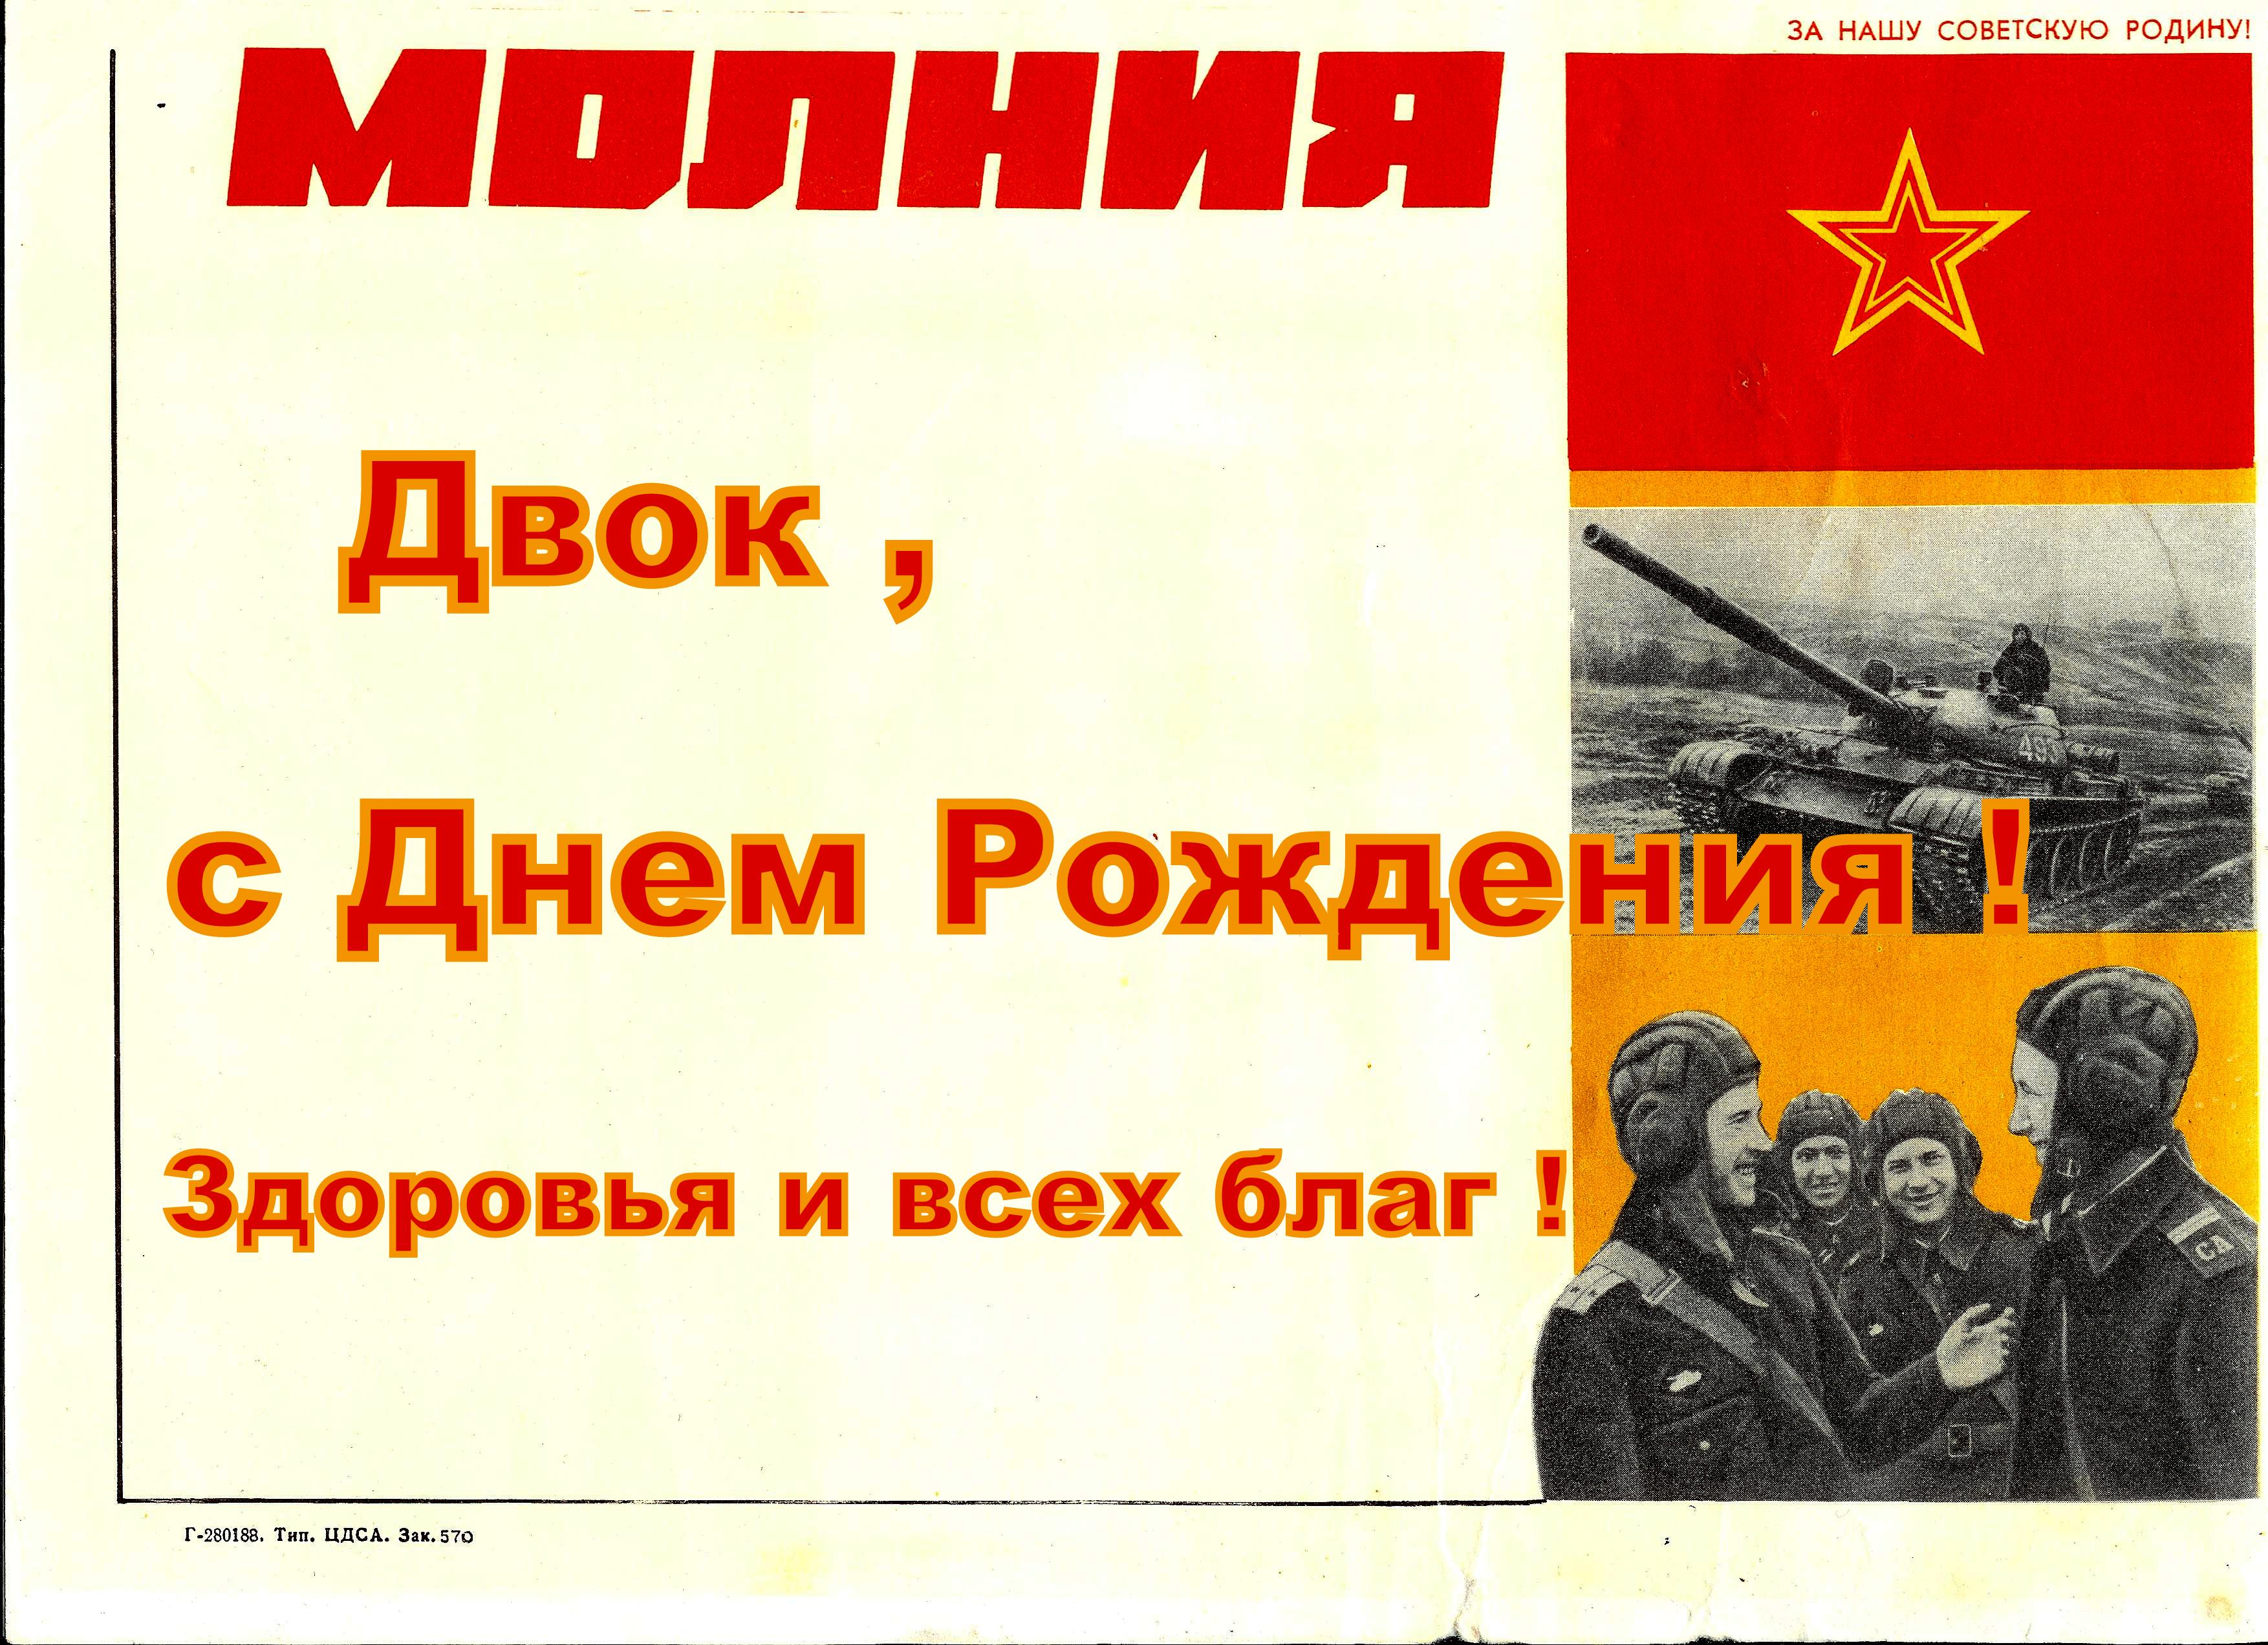 http://s7.uploads.ru/M4Vqh.jpg